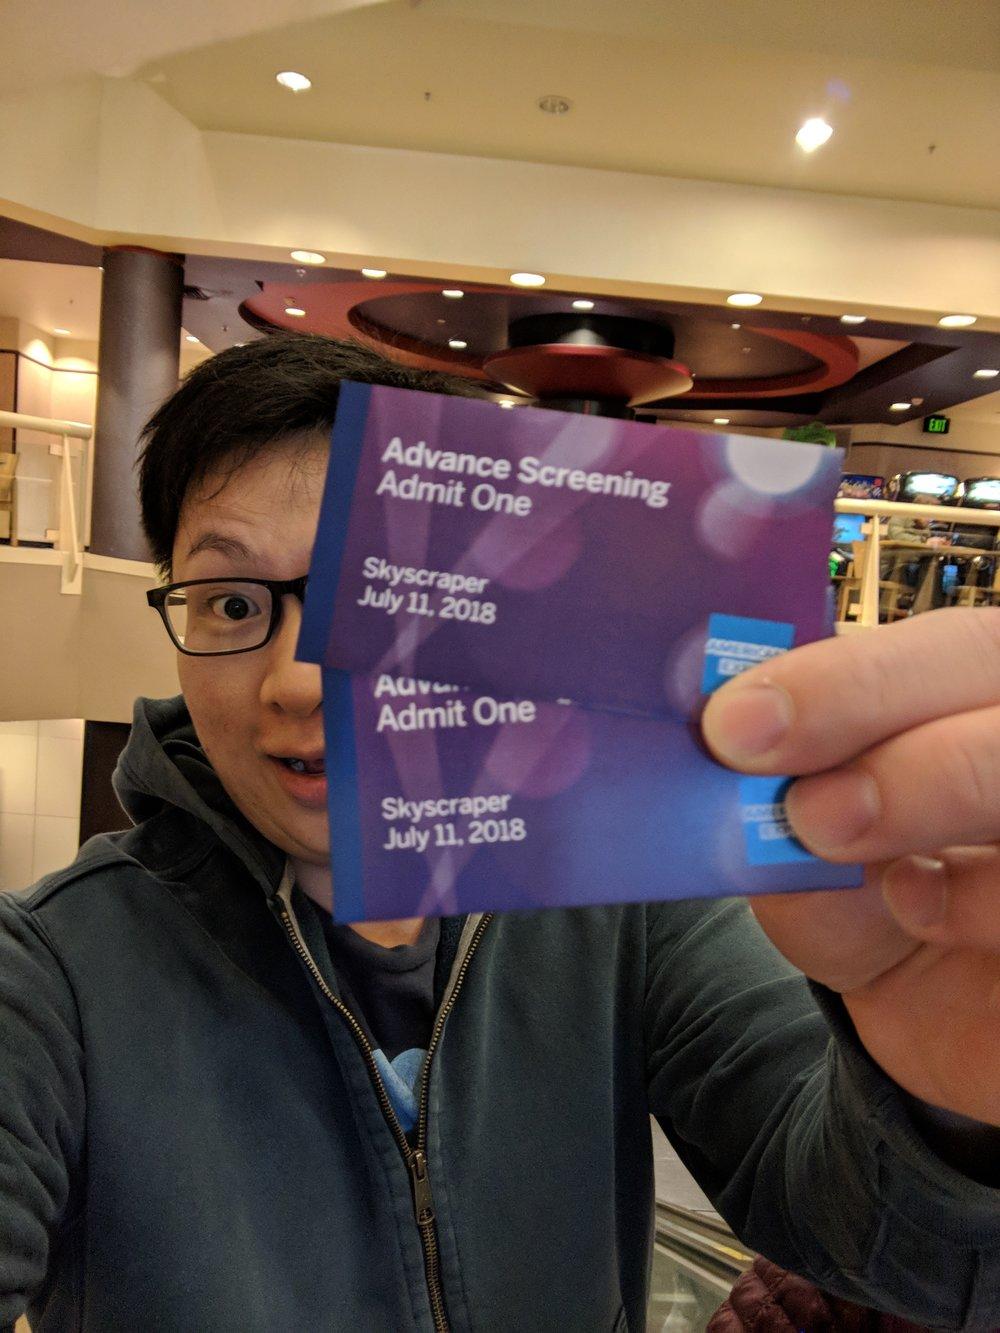 Amex Advance screenings